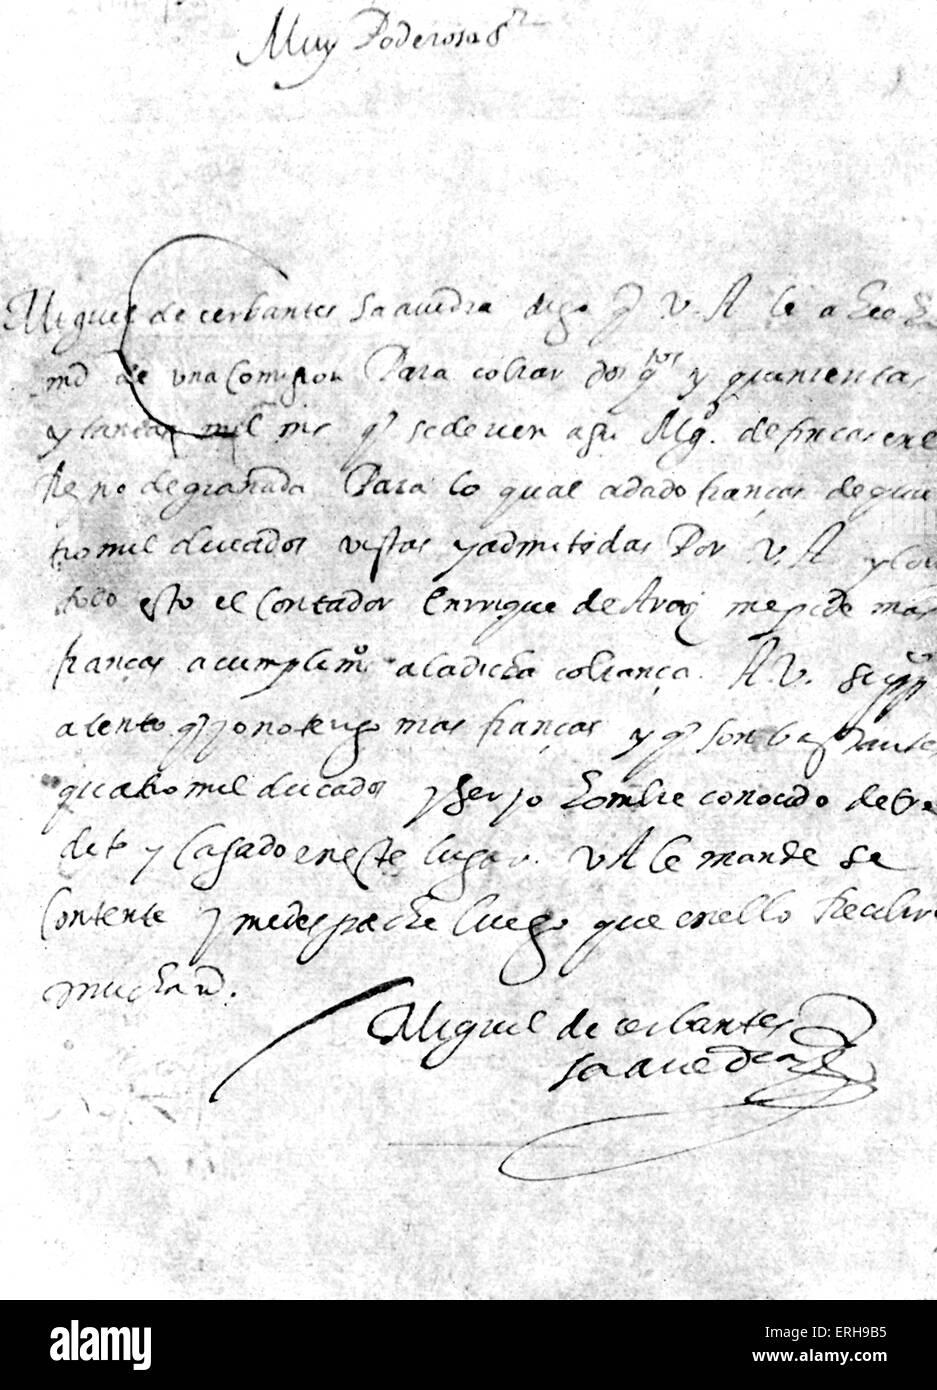 Letter by miguel de cervantes handwritten spanish novelist poet letter by miguel de cervantes handwritten spanish novelist poet and playwright 29 september 1547 23 april 1616 spiritdancerdesigns Gallery